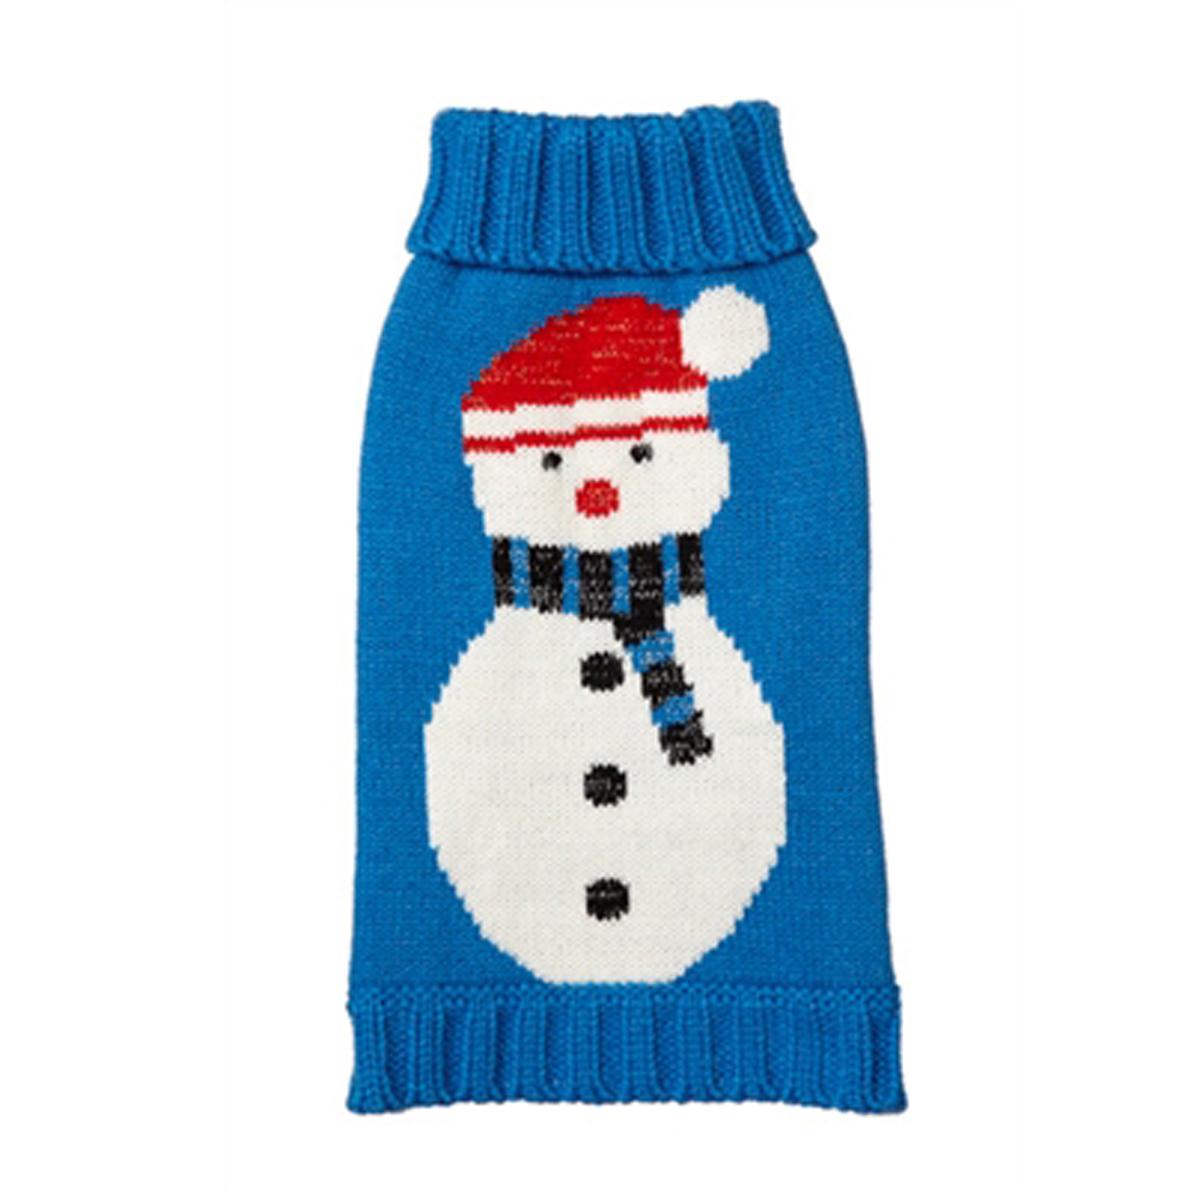 Snowman Turtleneck Dog Sweater - Blue